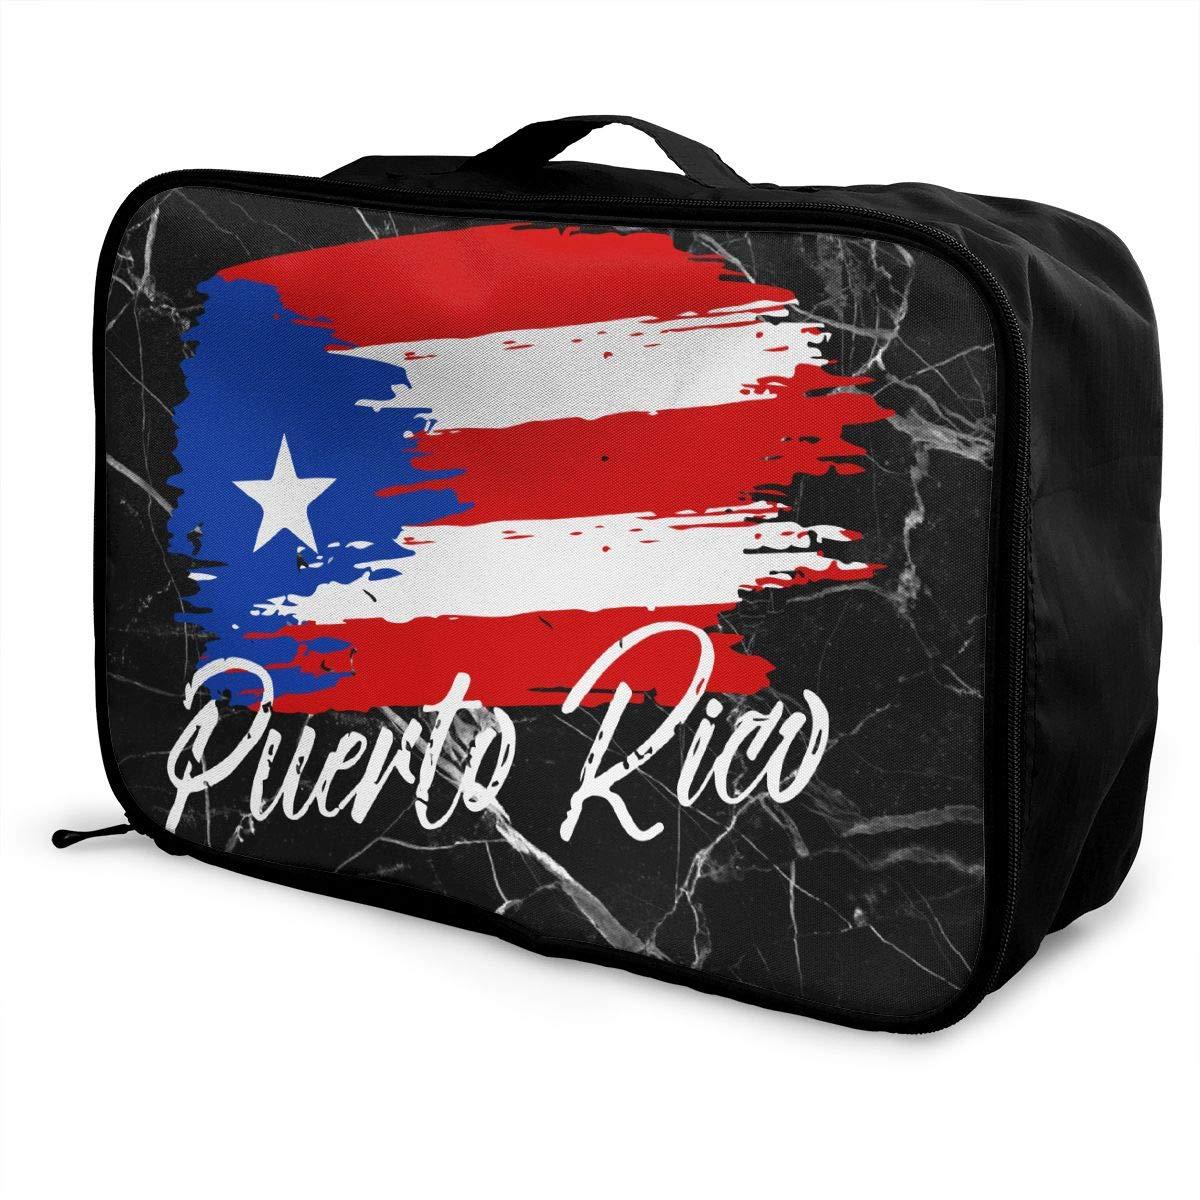 Puerto Rican Flag Grunge Design Luggage Bag Capacity Portable Large Travel Duffel Bag Makeup Storage